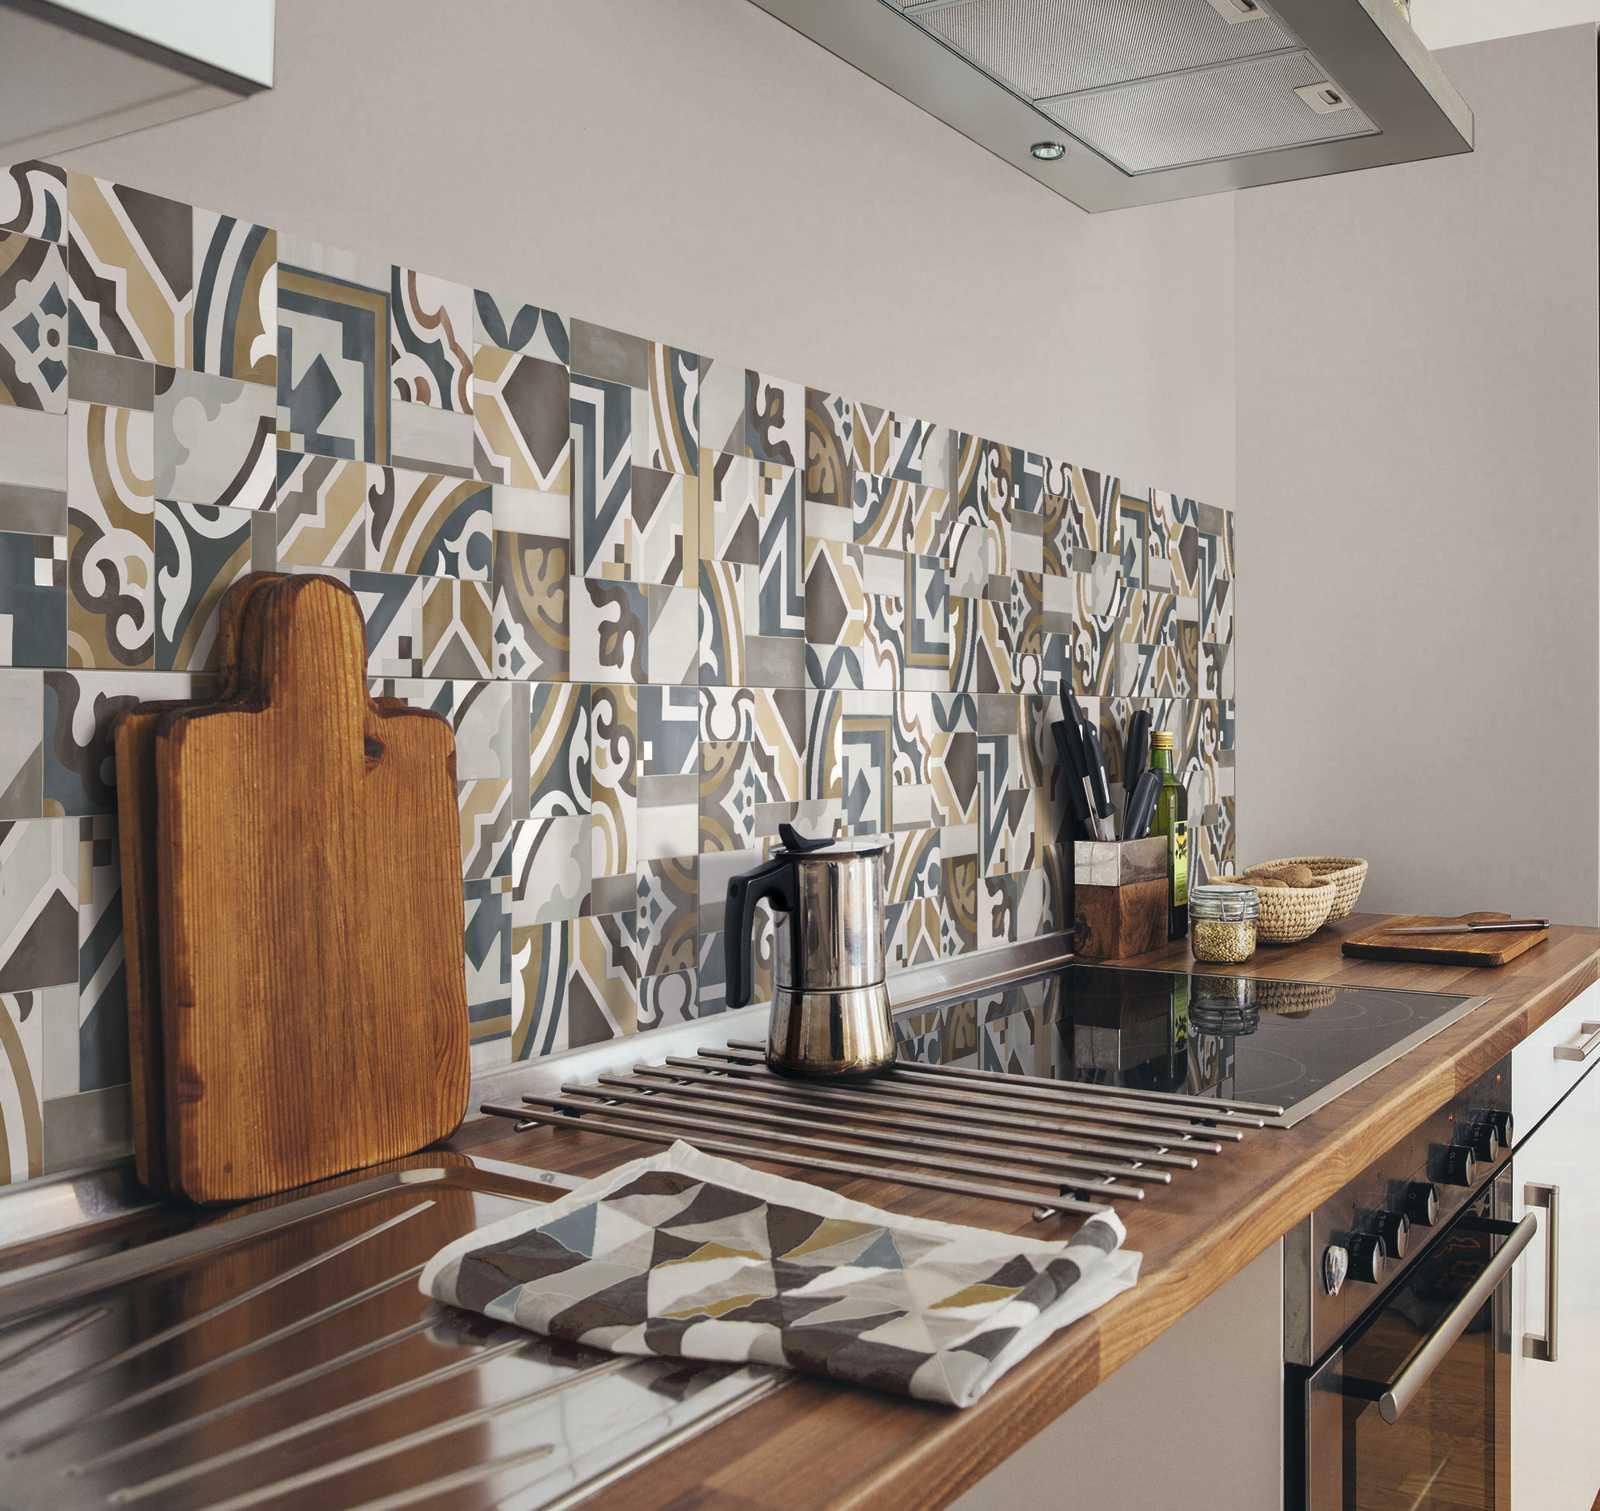 Piastrelle Per Parete Cucina piastrelle cucina: versatilità ed eleganza | ragno